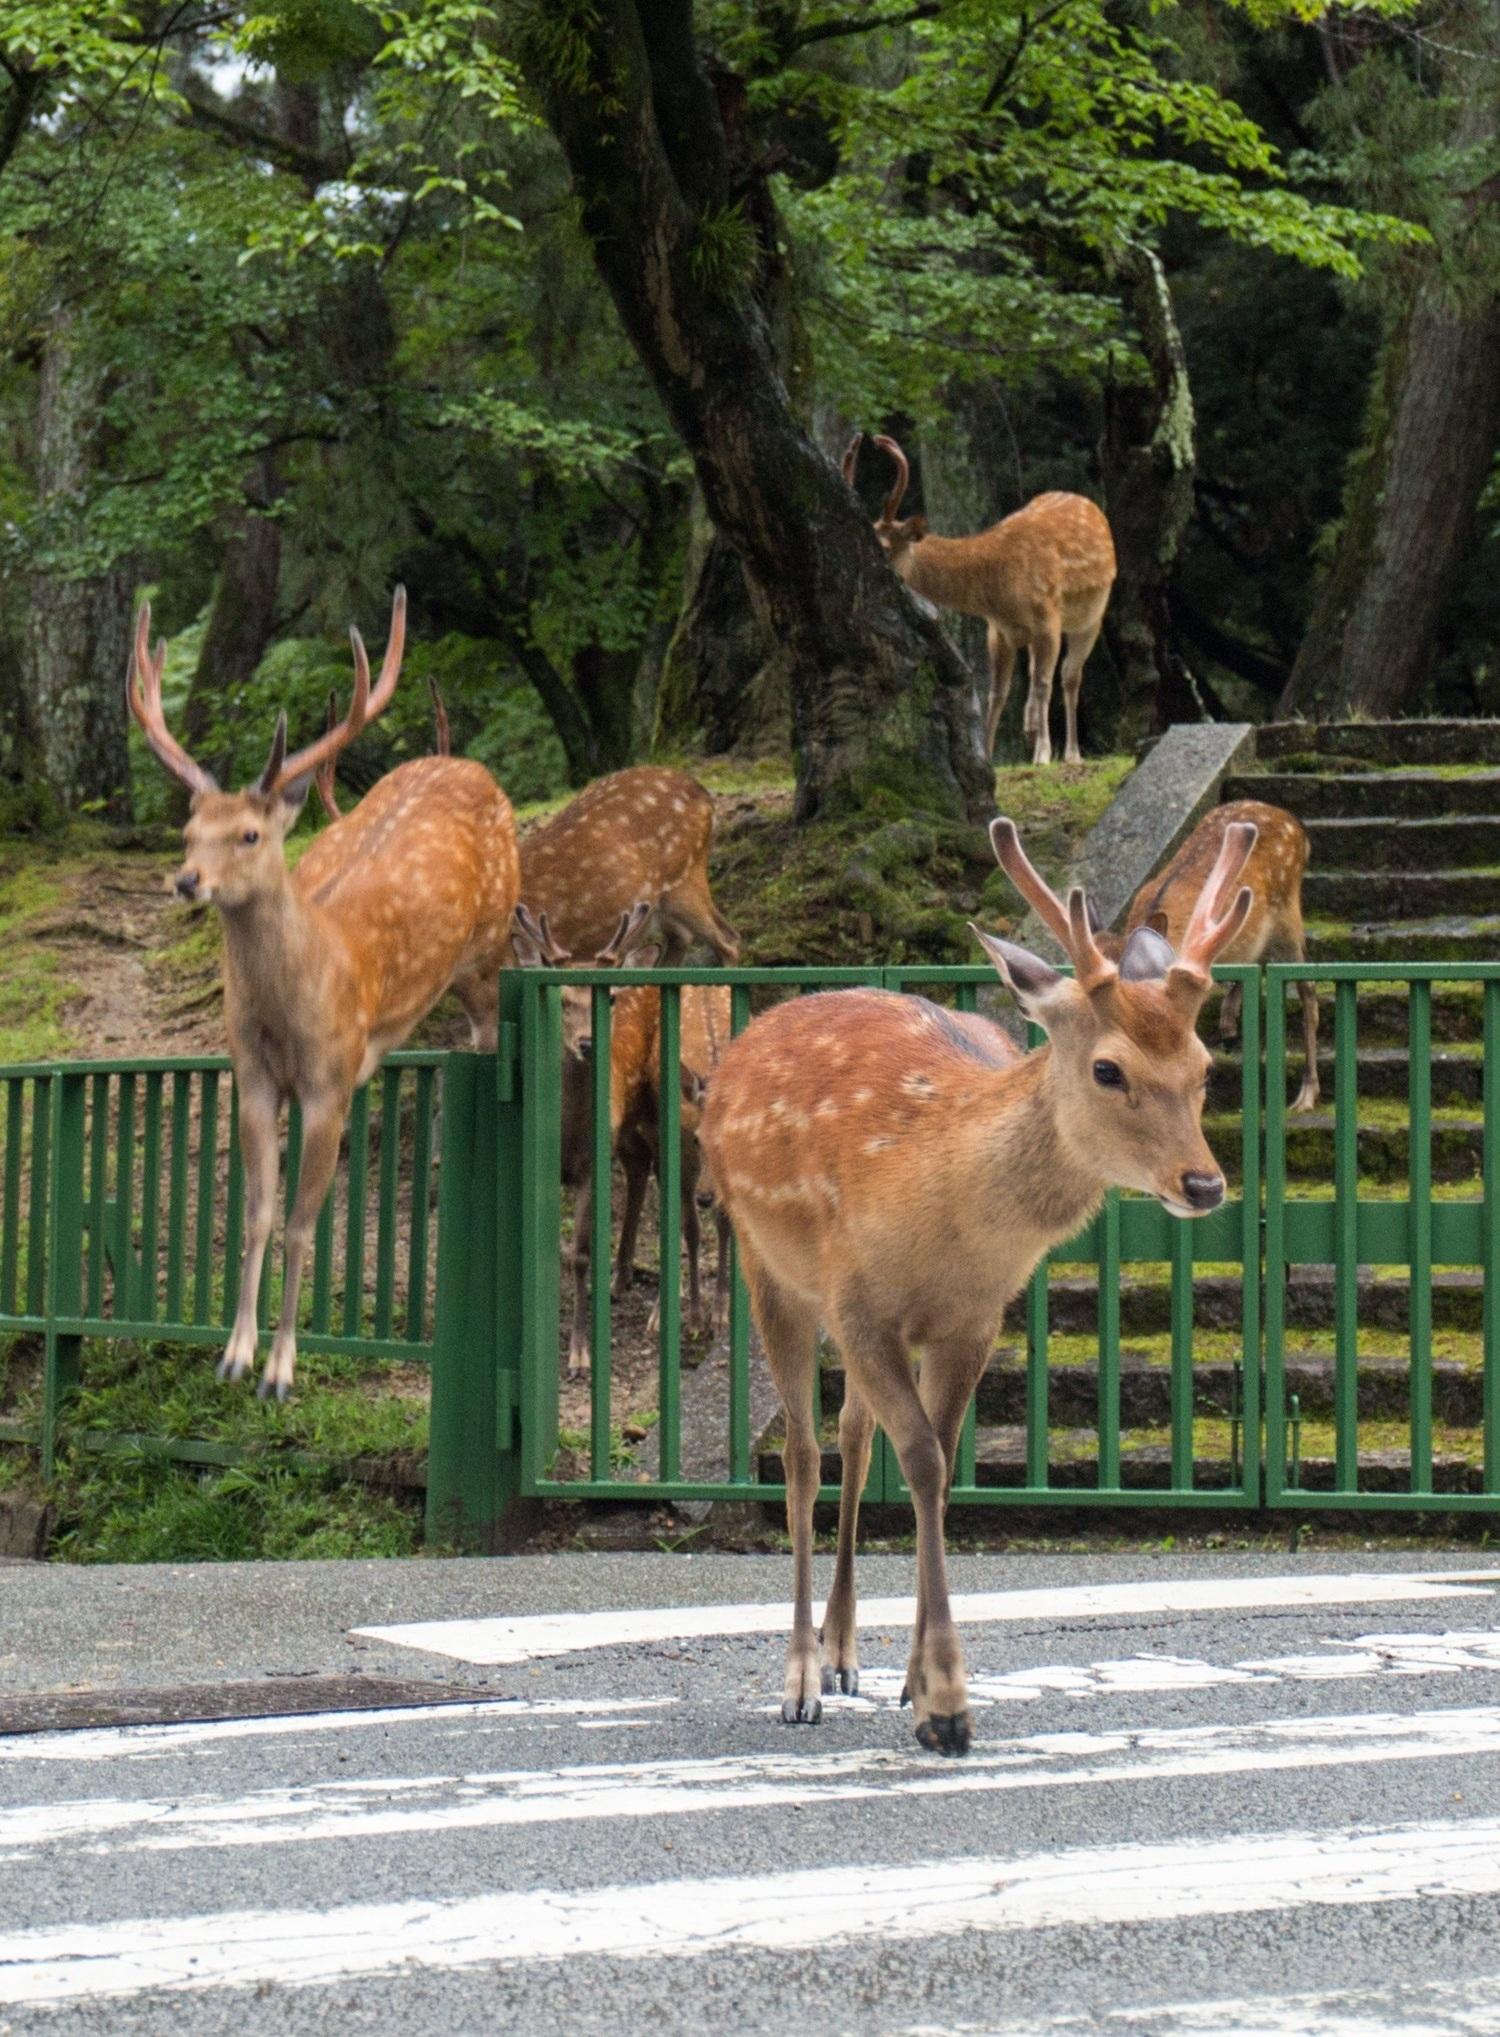 Yoko+Ishii%2C+from+Deer+Planet.jpg